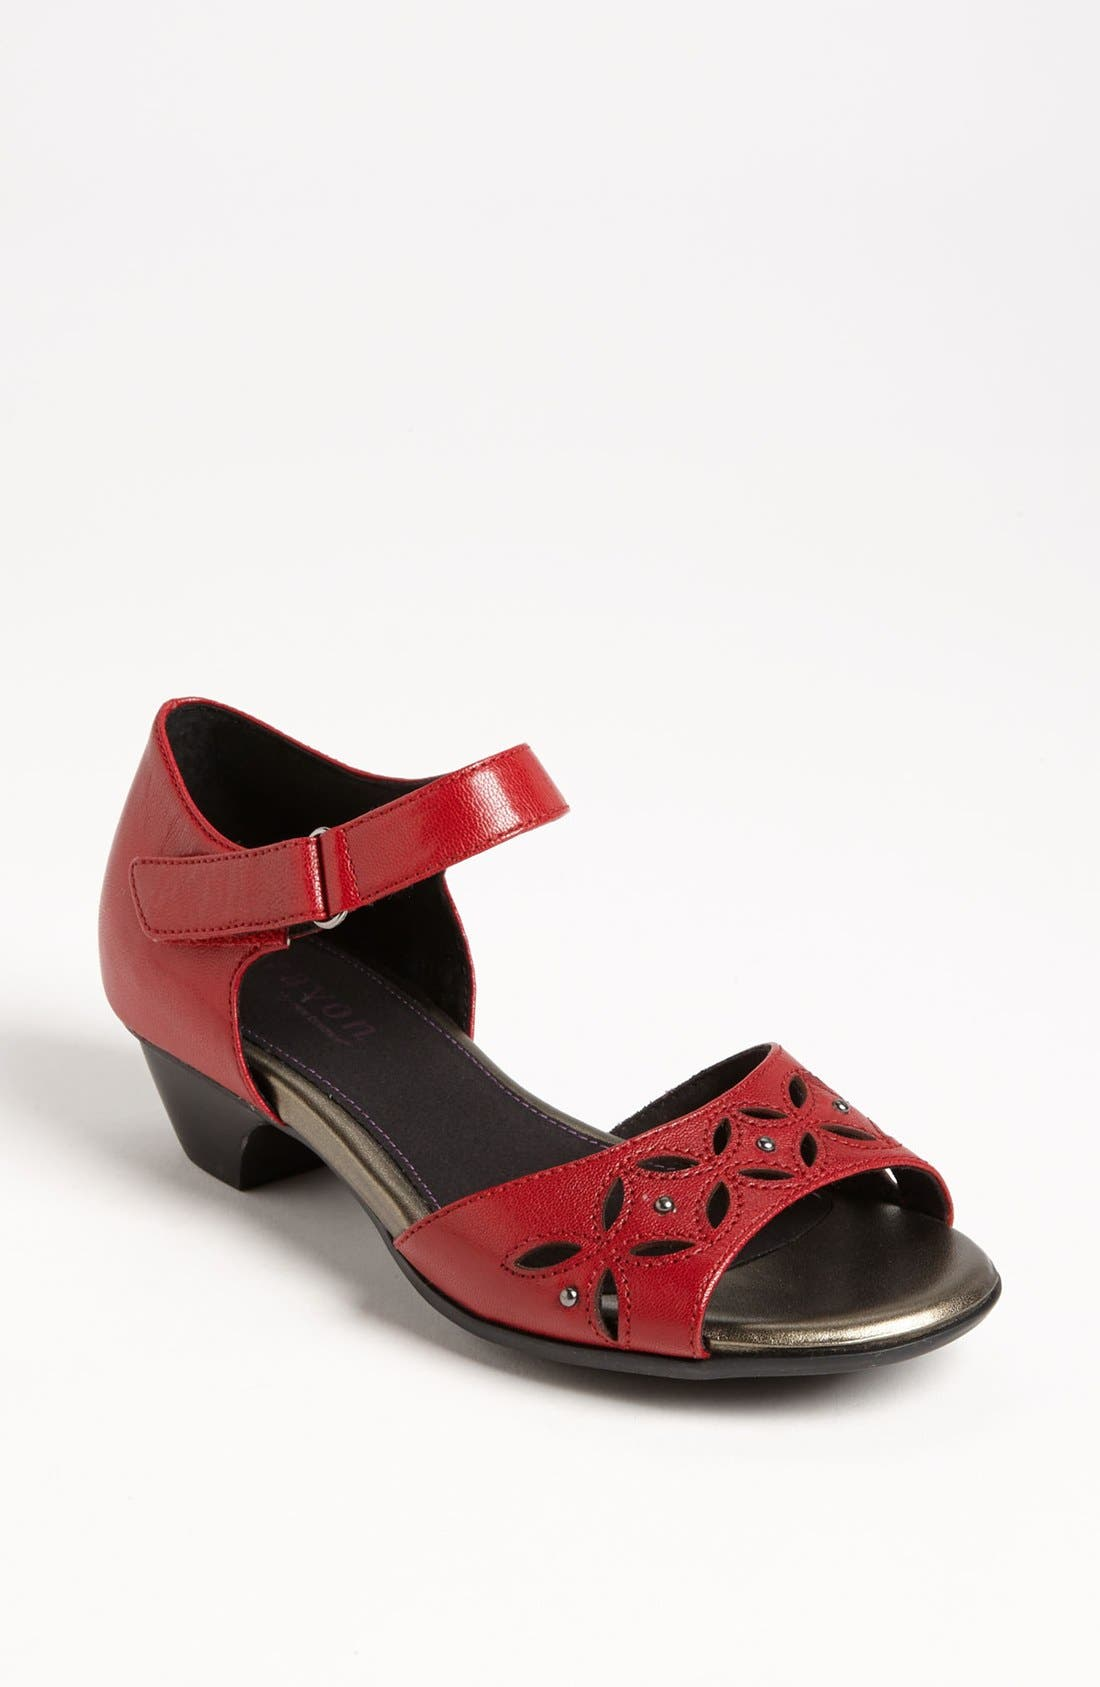 Main Image - Aravon 'Sofia' Sandal